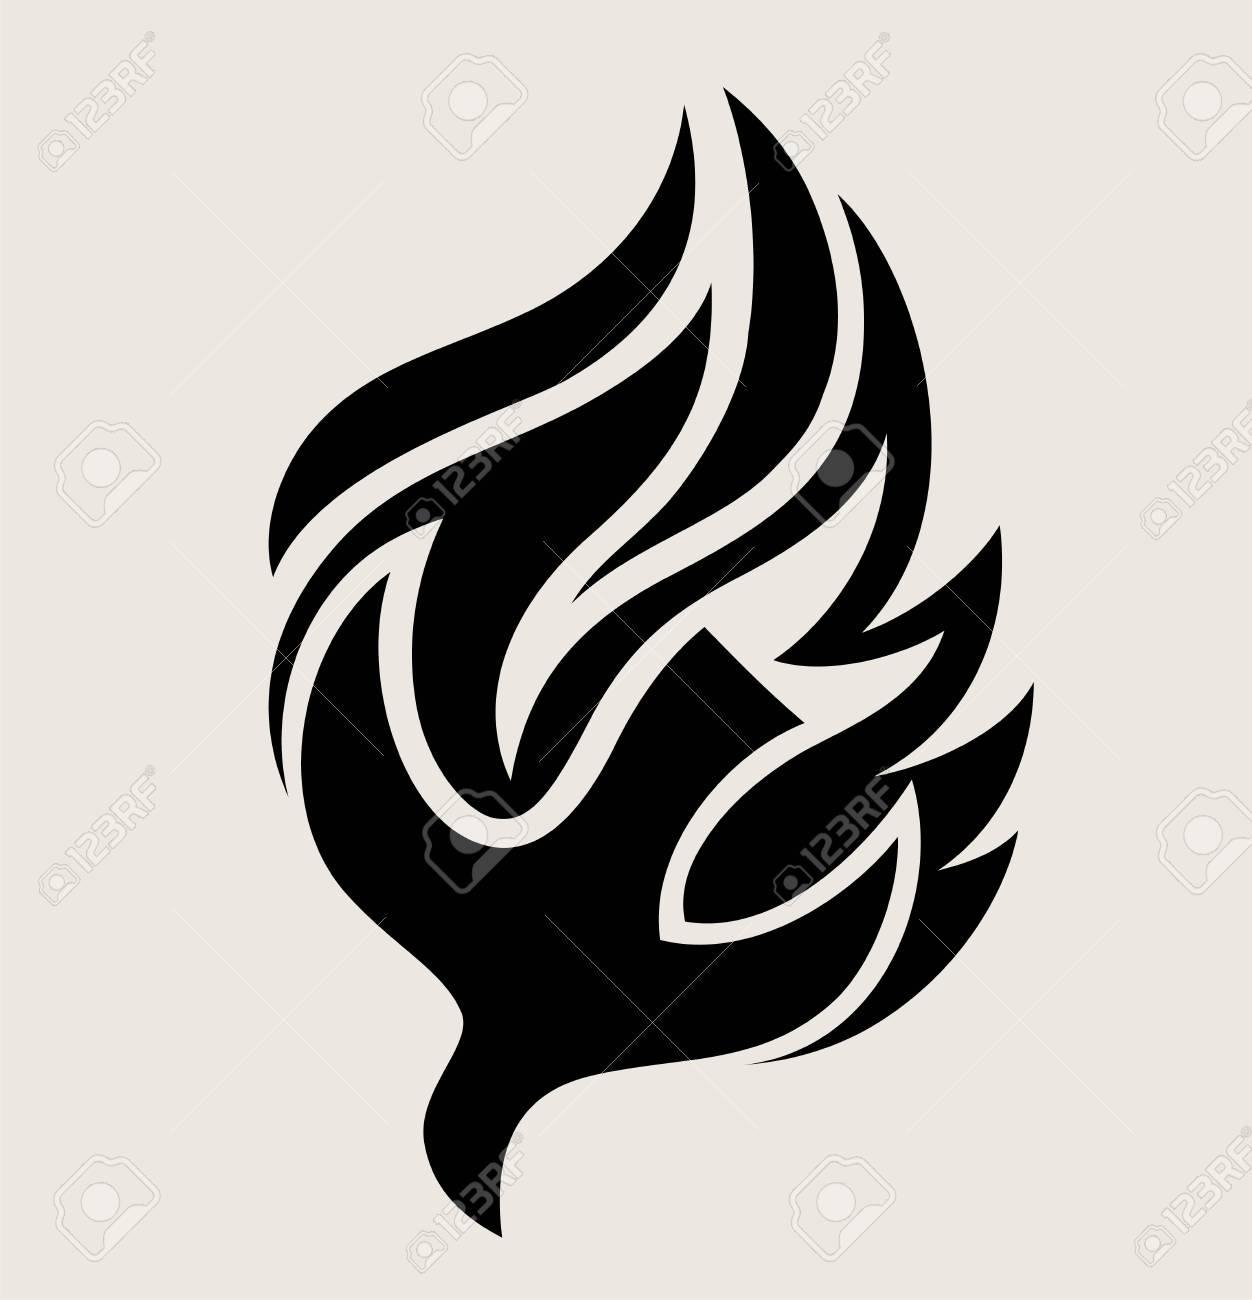 Holyspirit Fire Logo, art vector design illustration - 97907644